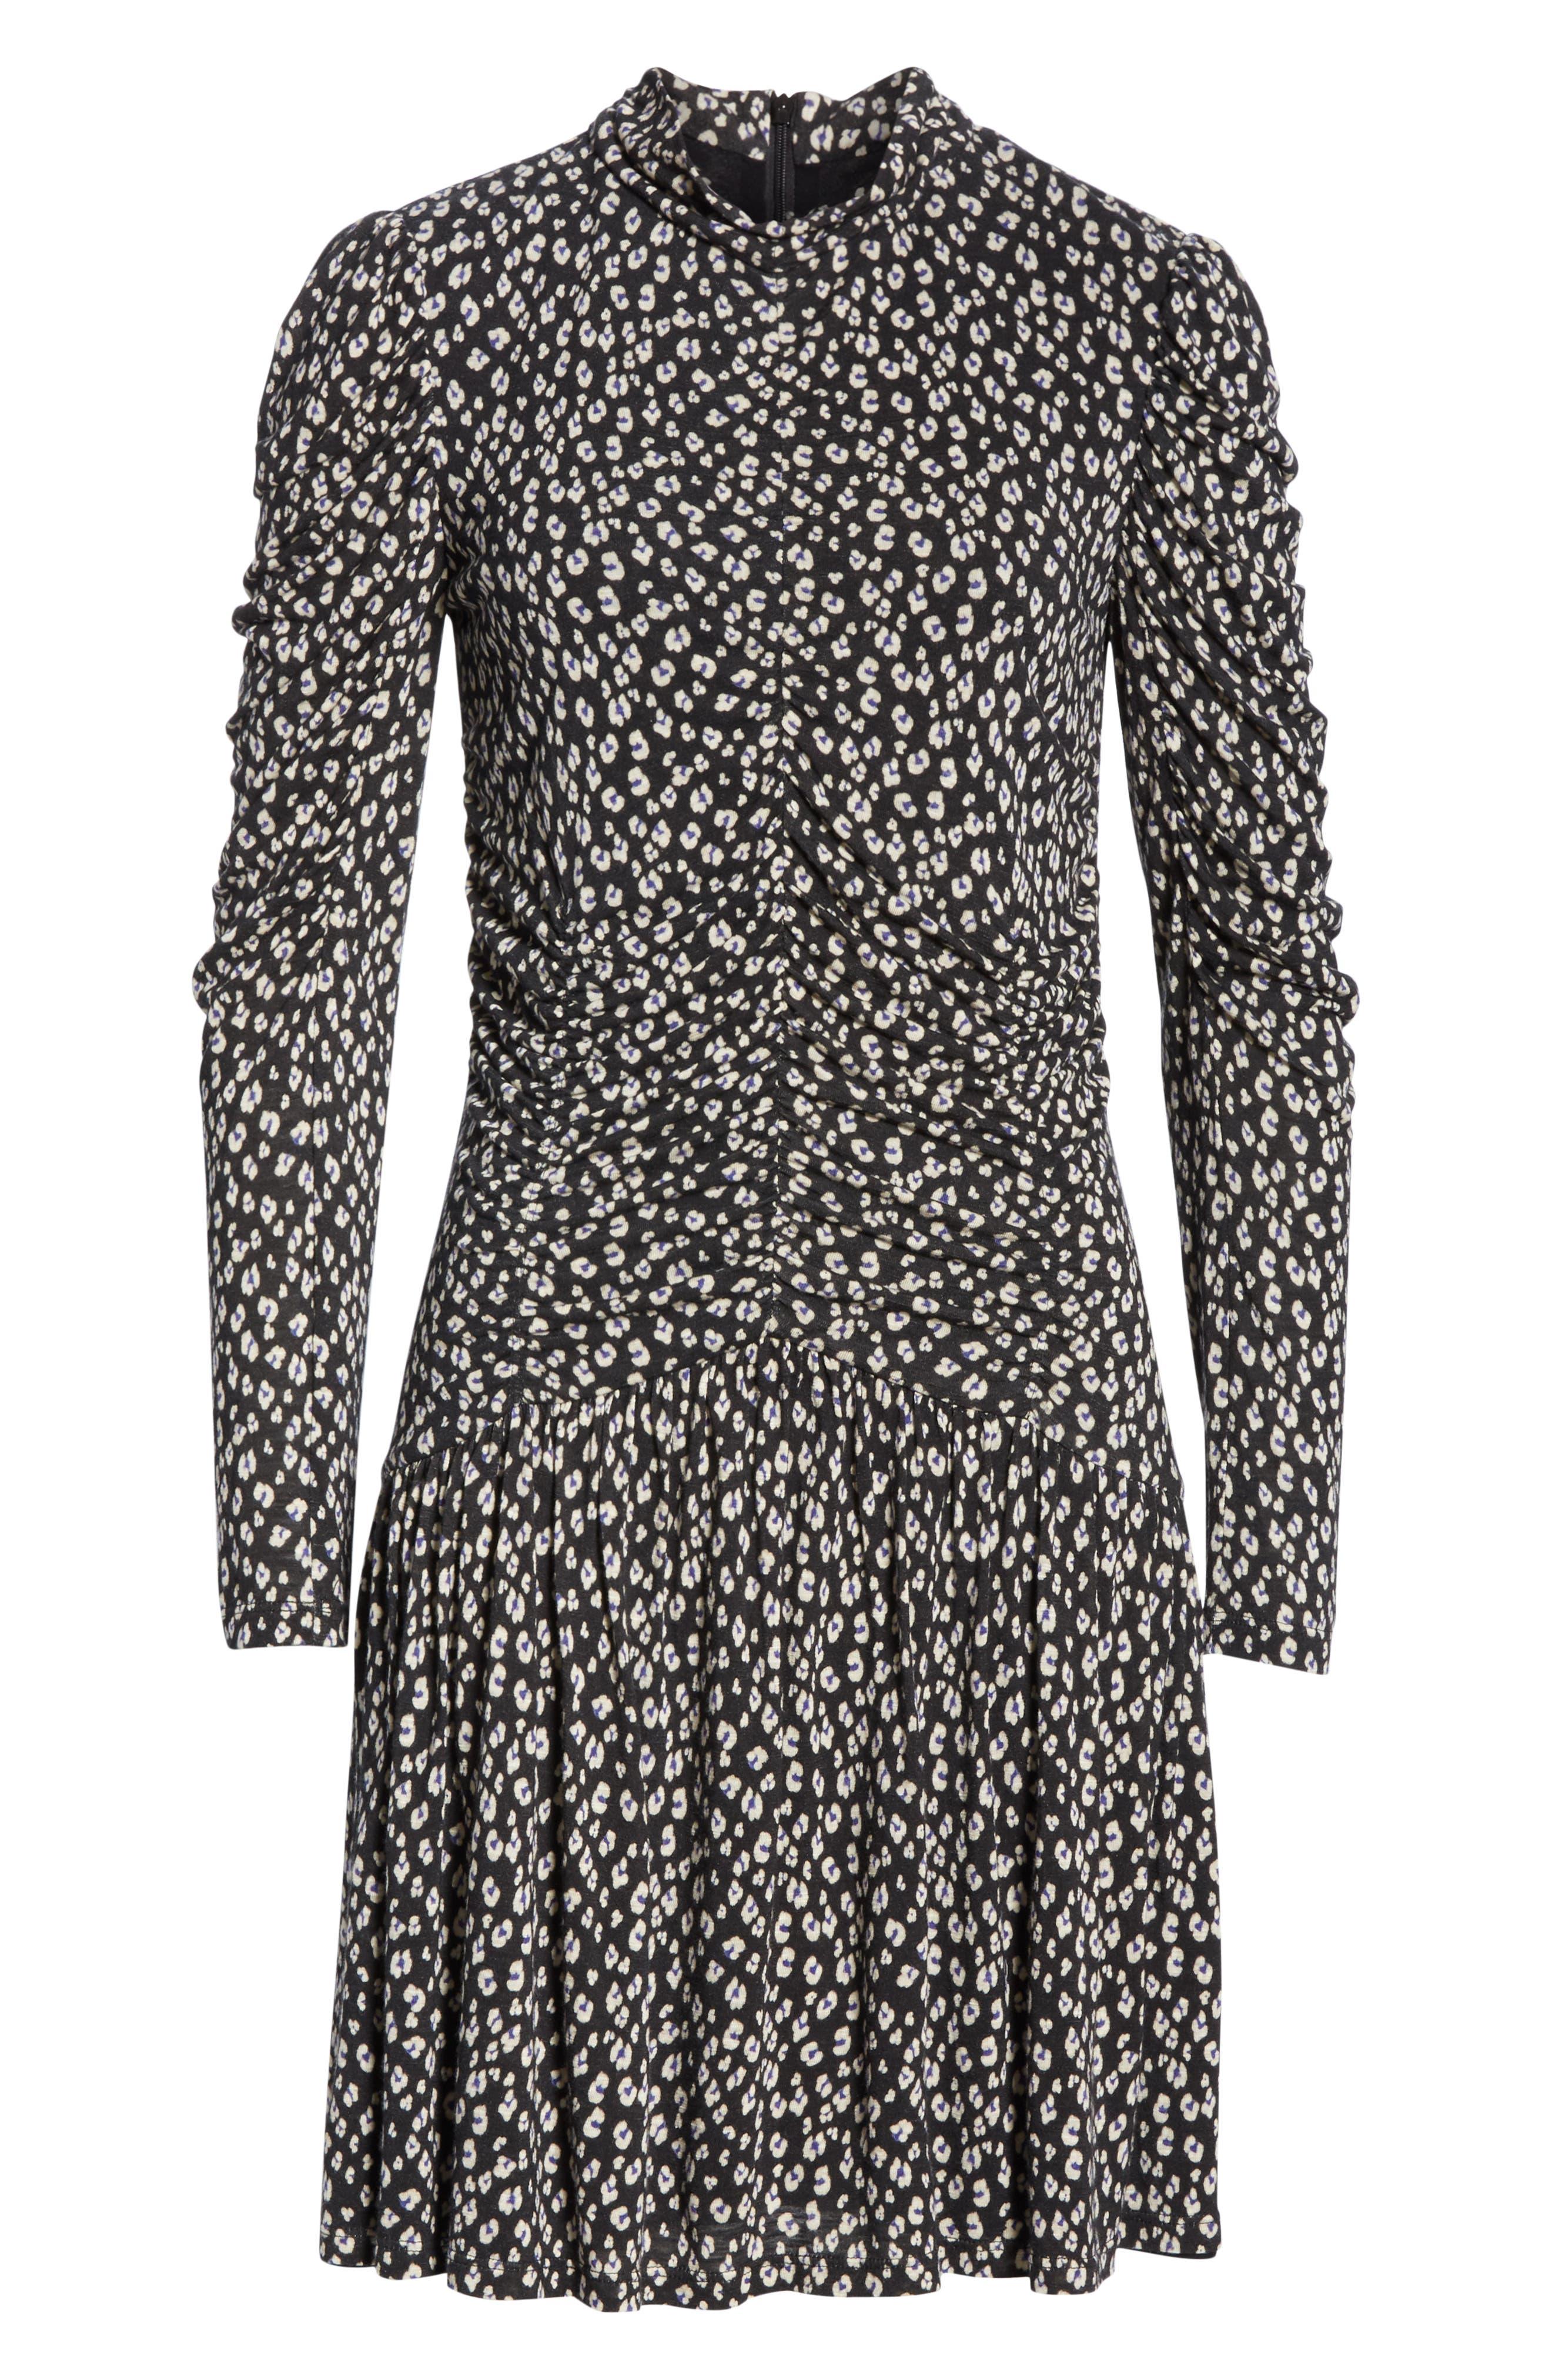 REBECCA TAYLOR, Cheetah Ruched Jersey Dress, Alternate thumbnail 6, color, 014